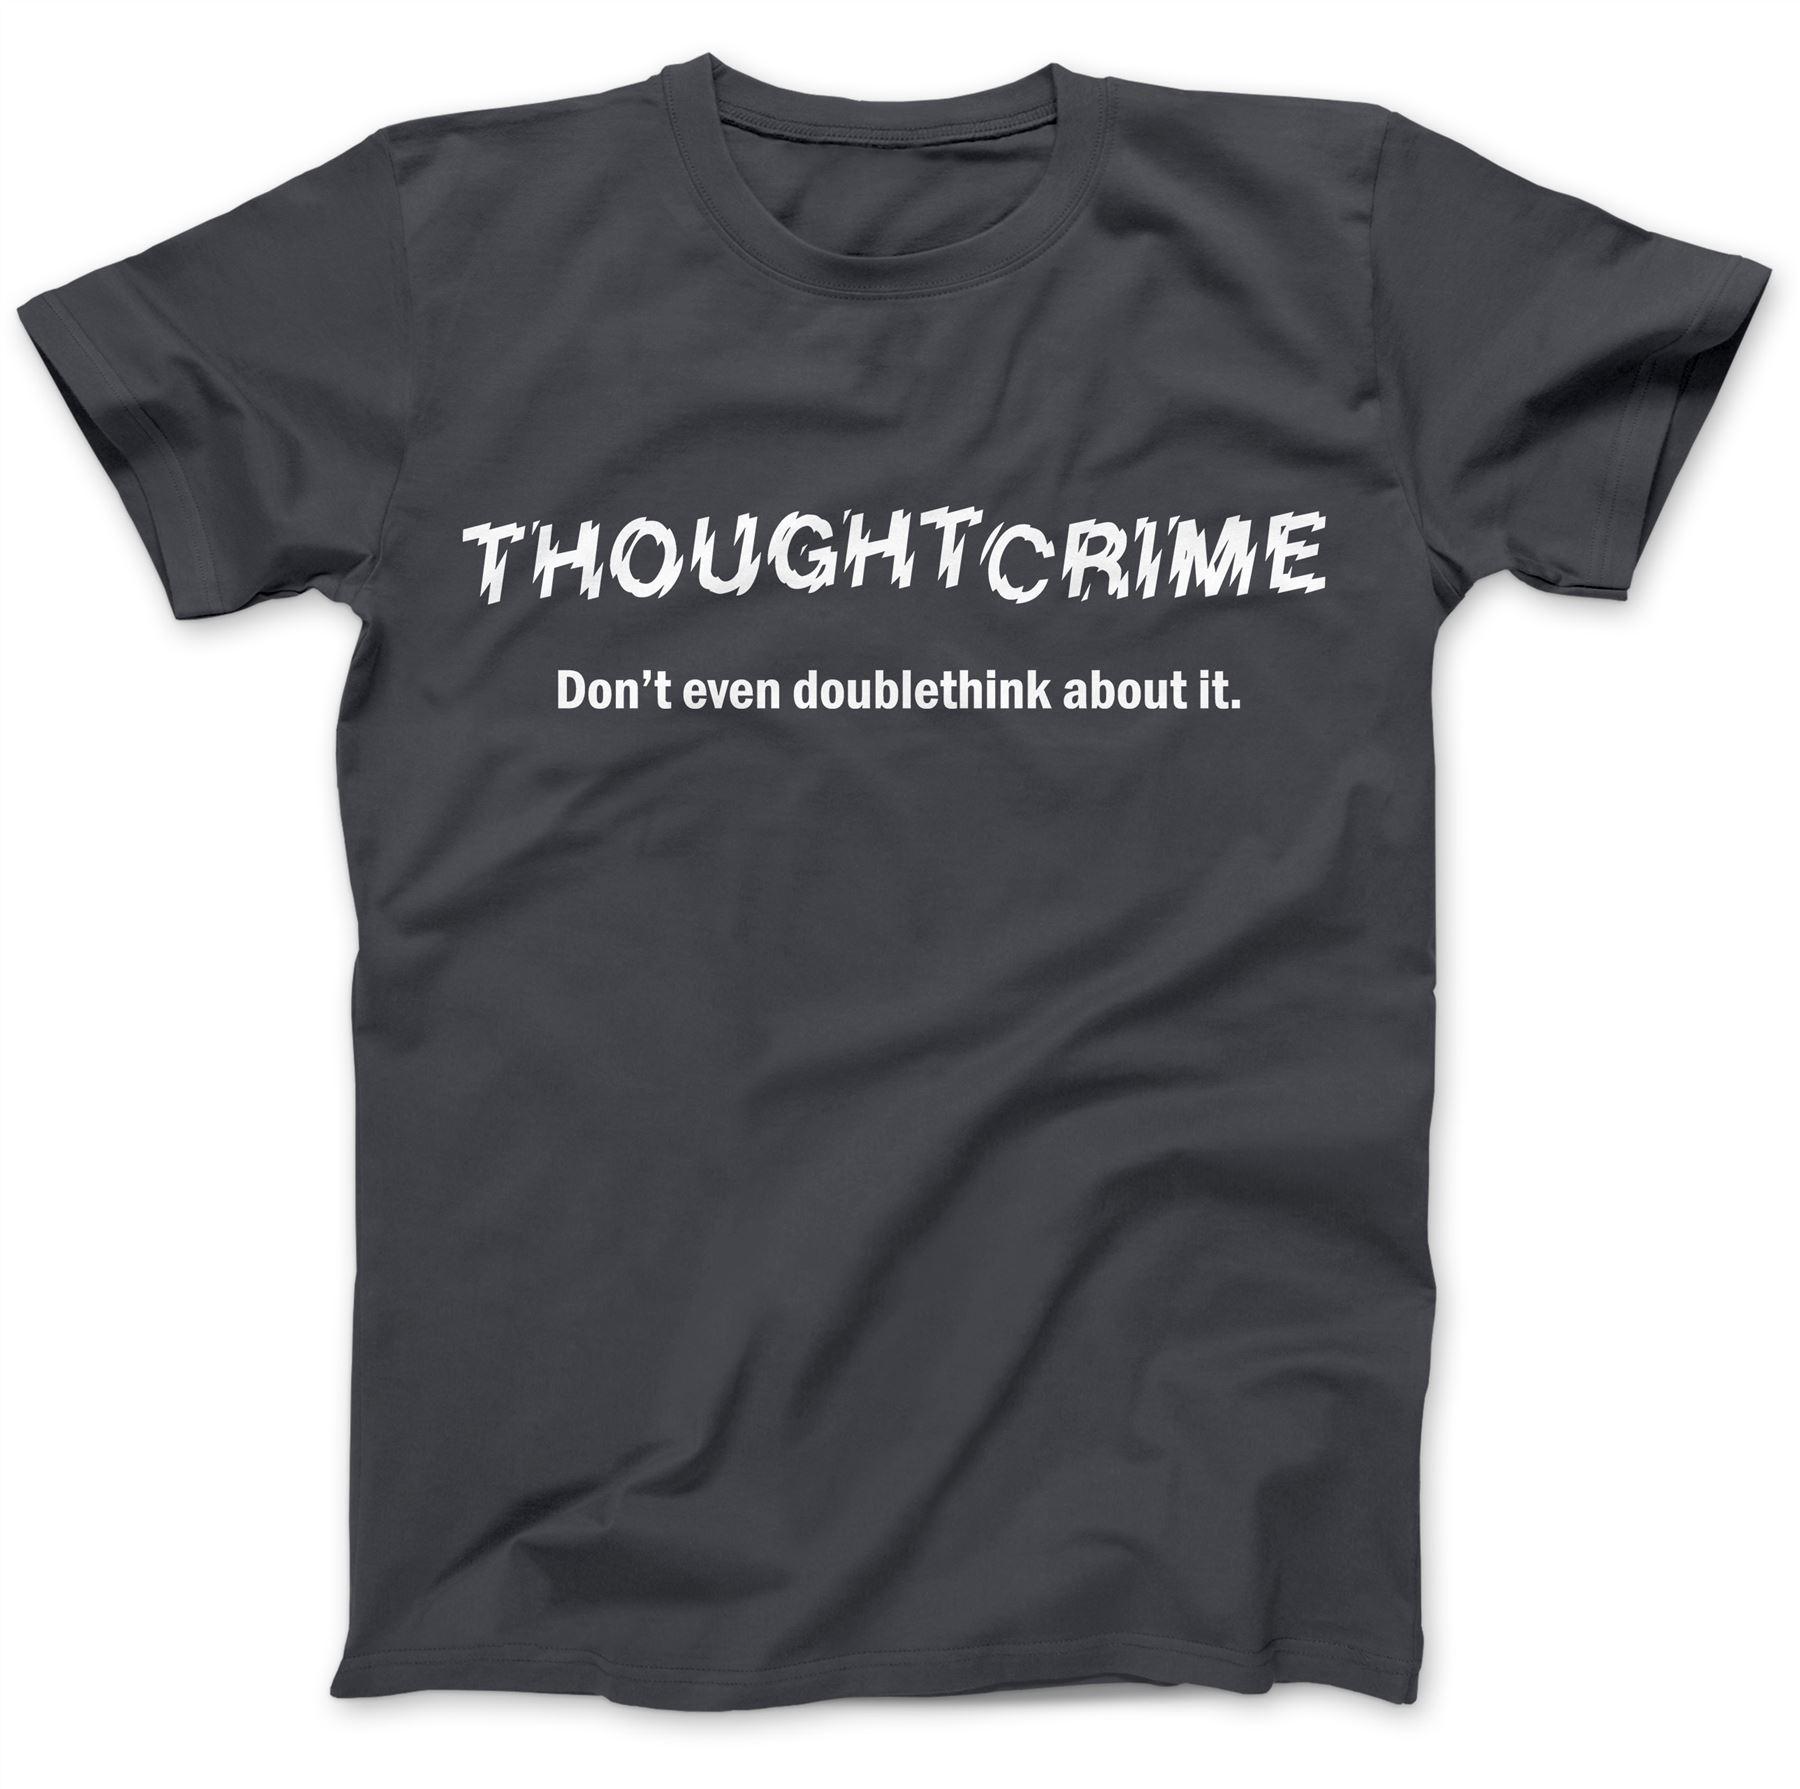 1984-Thought-Crime-George-Orwell-T-Shirt-100-Premium-Cotton-Animal-Farm miniatuur 10